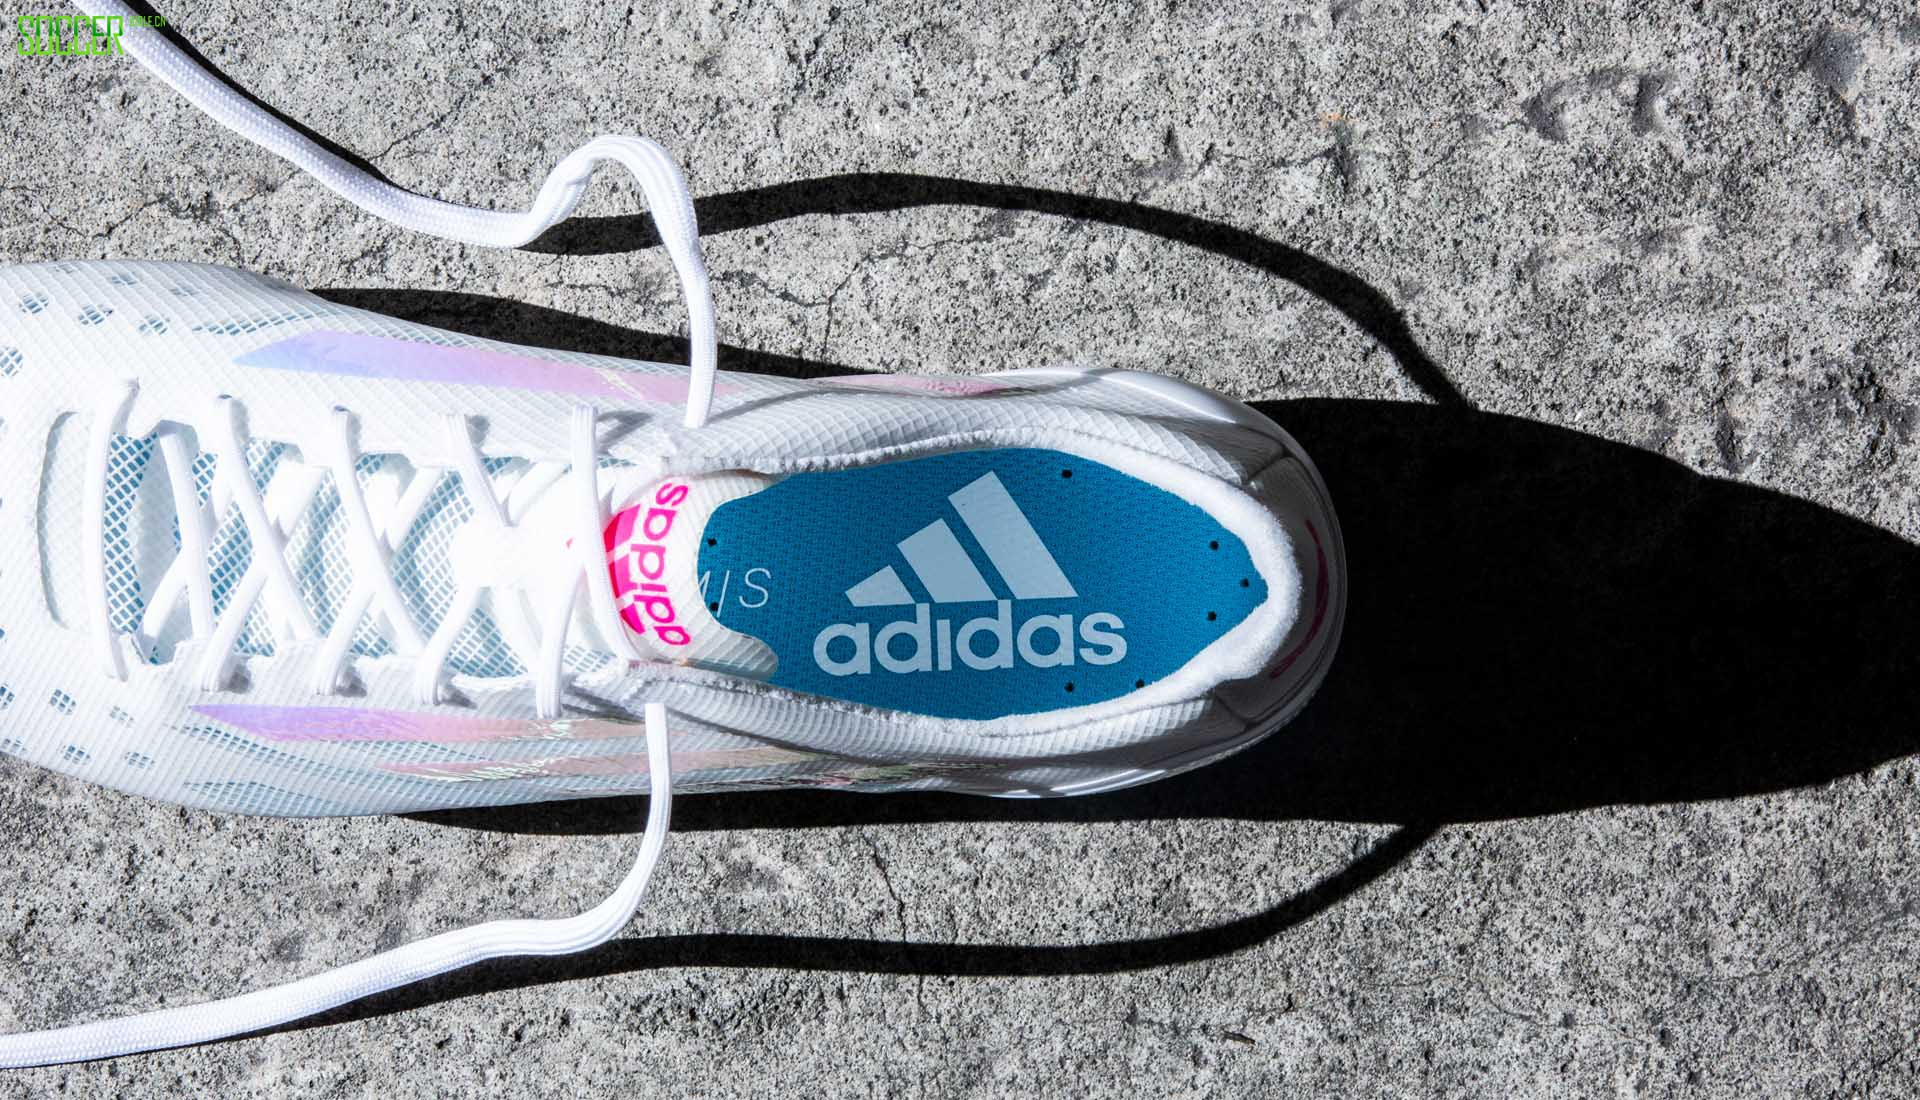 4-adidas-99-boot-min